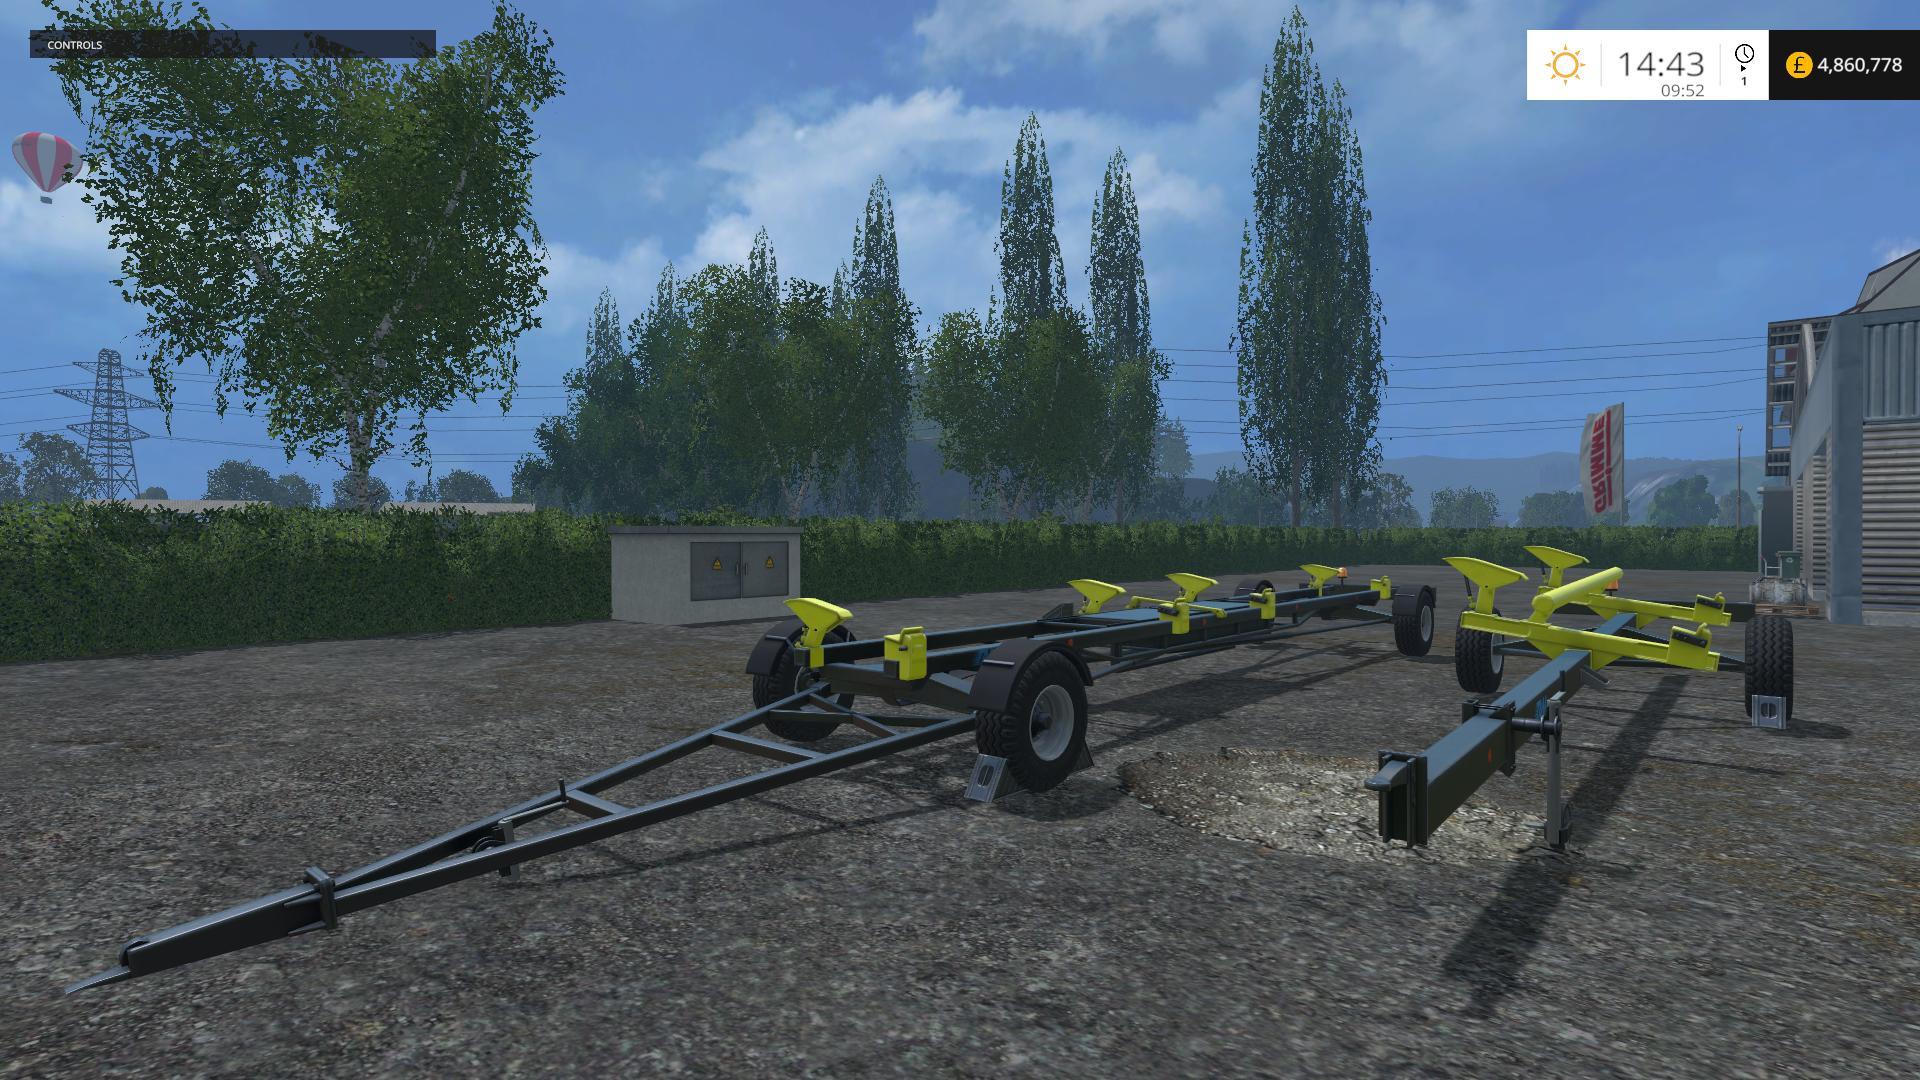 thuringer-agrar-header-trailers-with-locking-script-v1-1_1